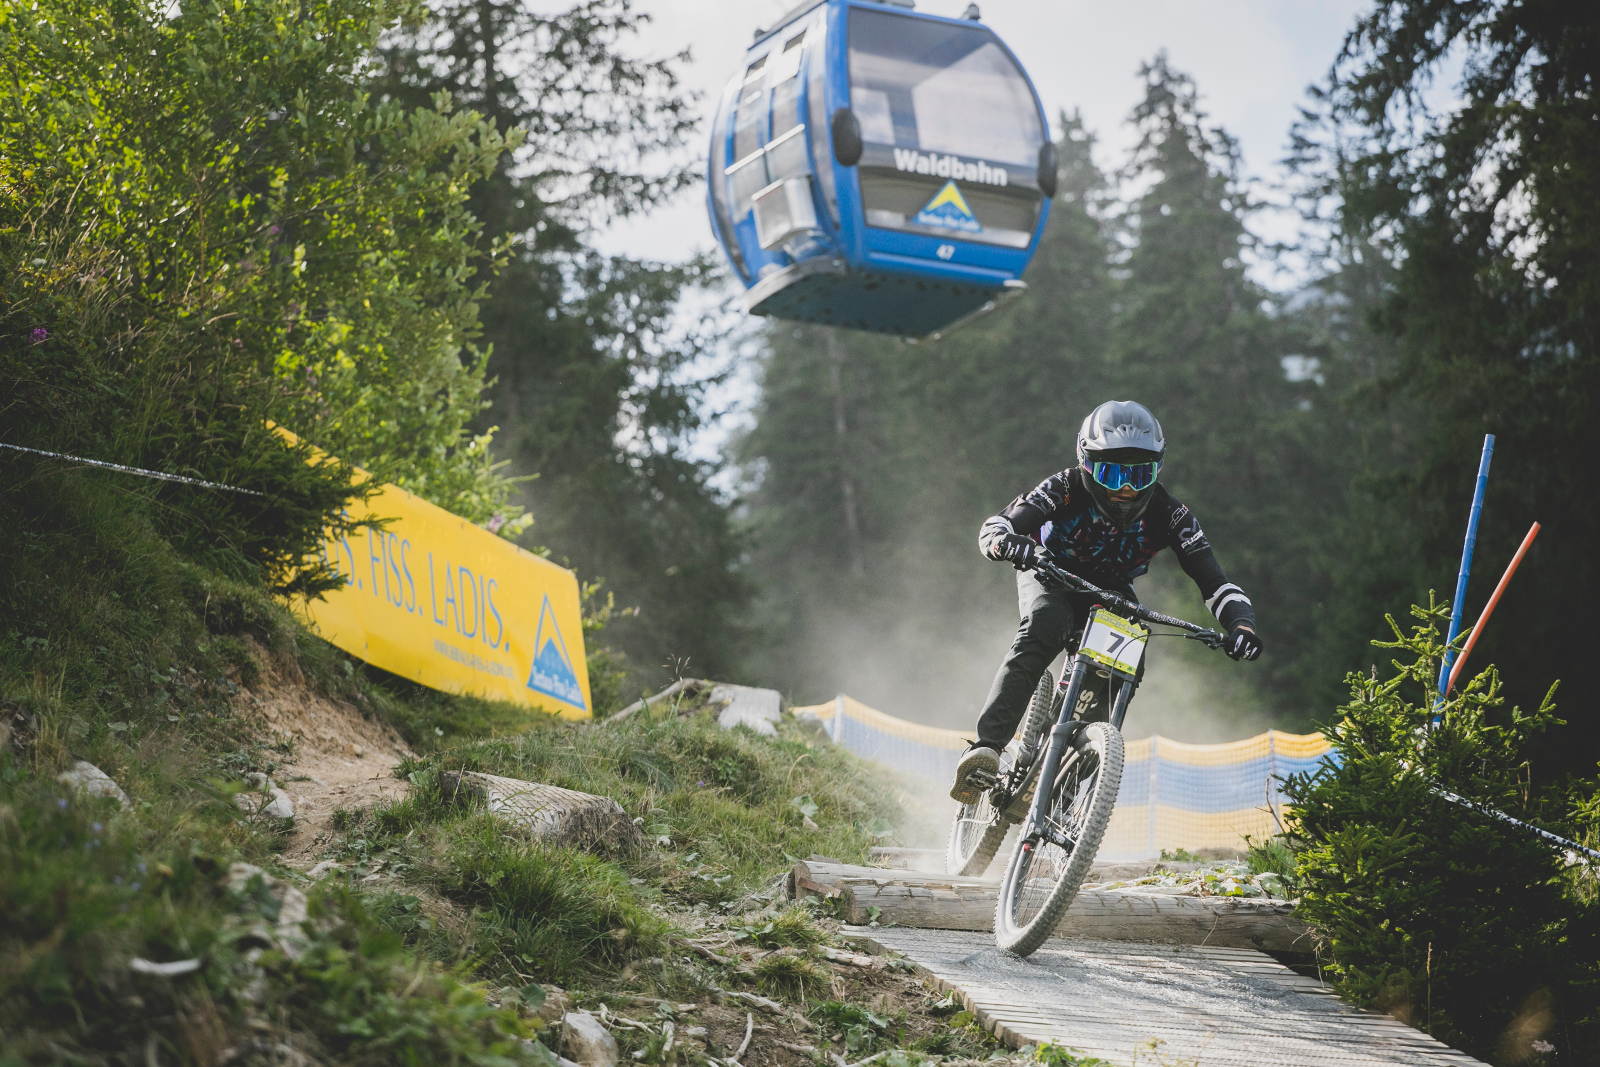 mtb-festival-sfl-2018-downhill-c-felix-pirker